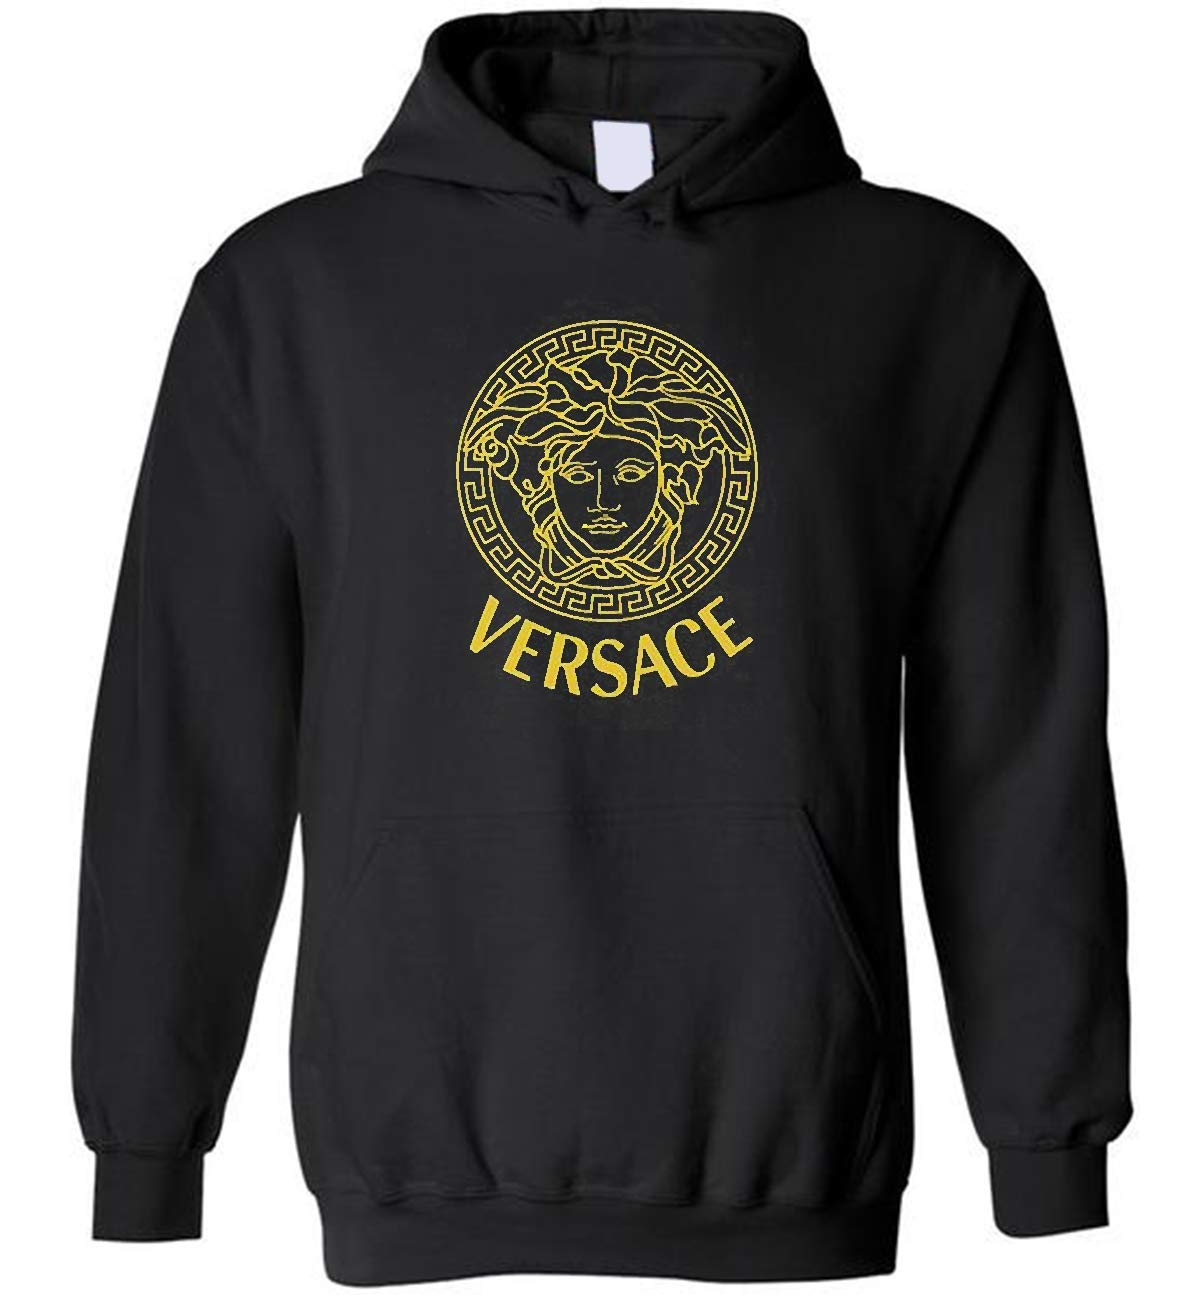 Ver sace Inspired Unisex Hoodie For You Ver sace Vintage Embellished Medusa Hoodie Gift Shirt